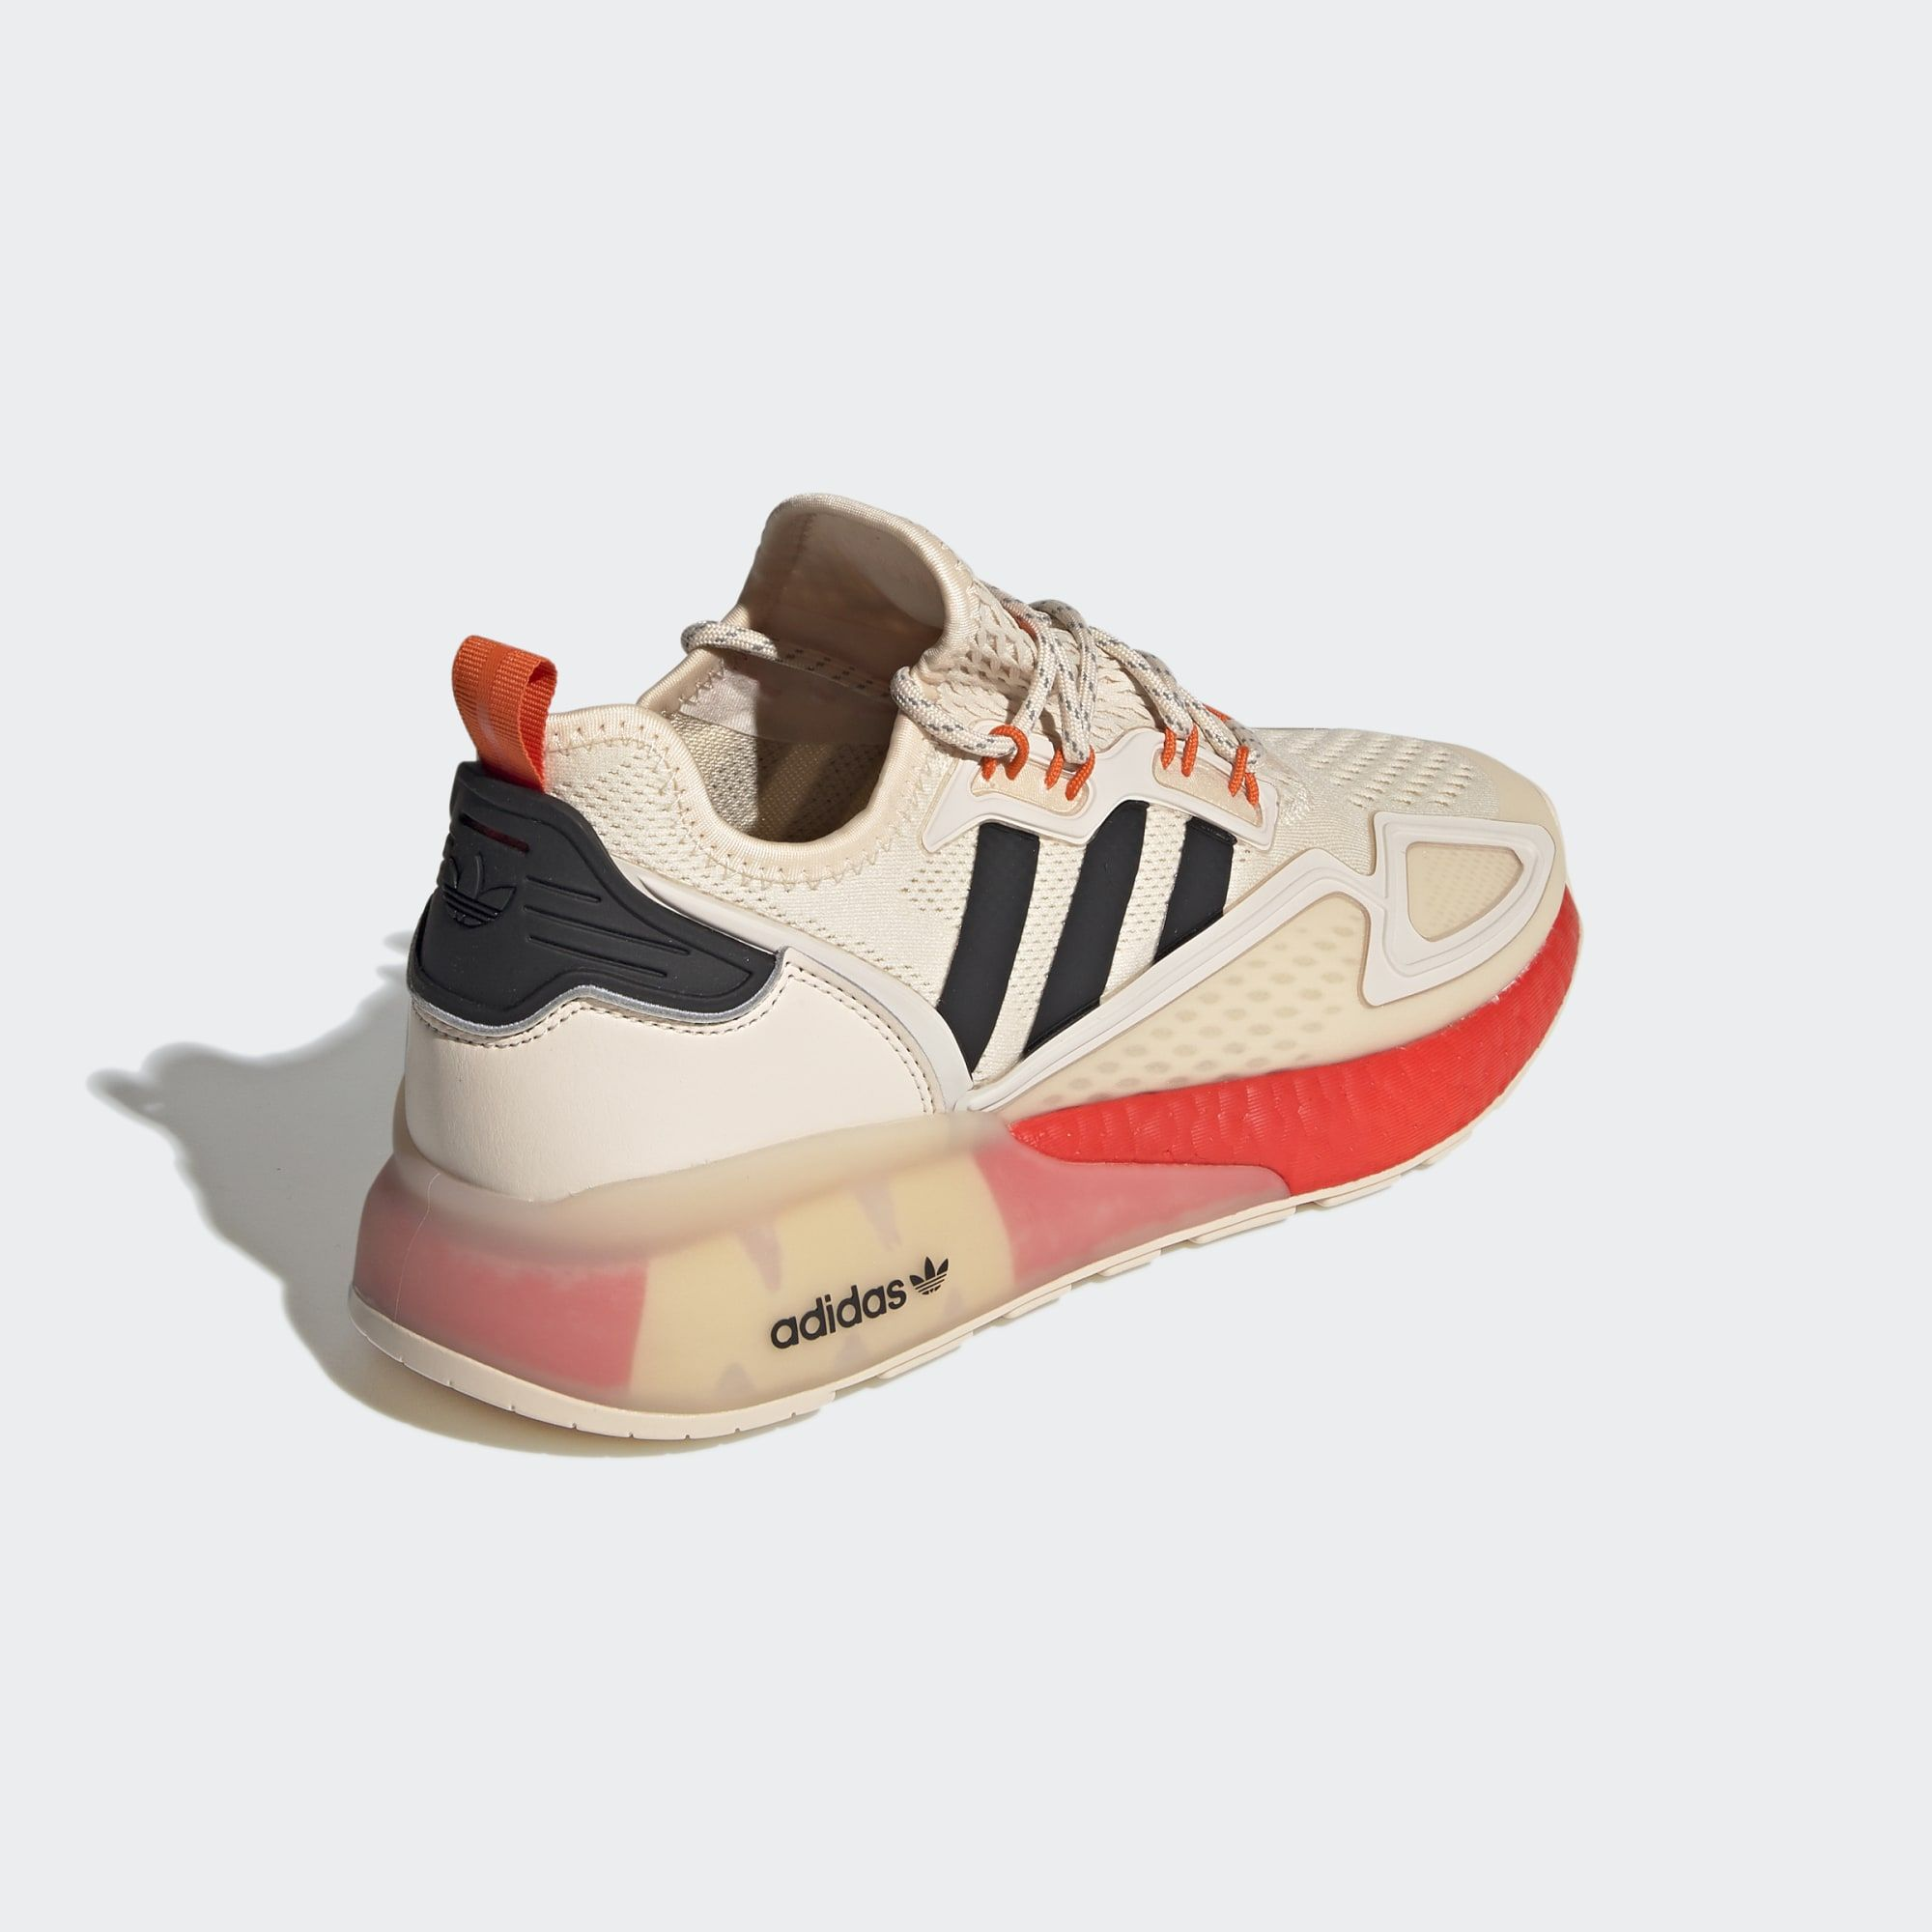 máquina de coser comer Oeste  adidas Sapatos ZX 2K Boost - Bege   adidas Portugal   Boost shoes, Adidas  zx, Adidas